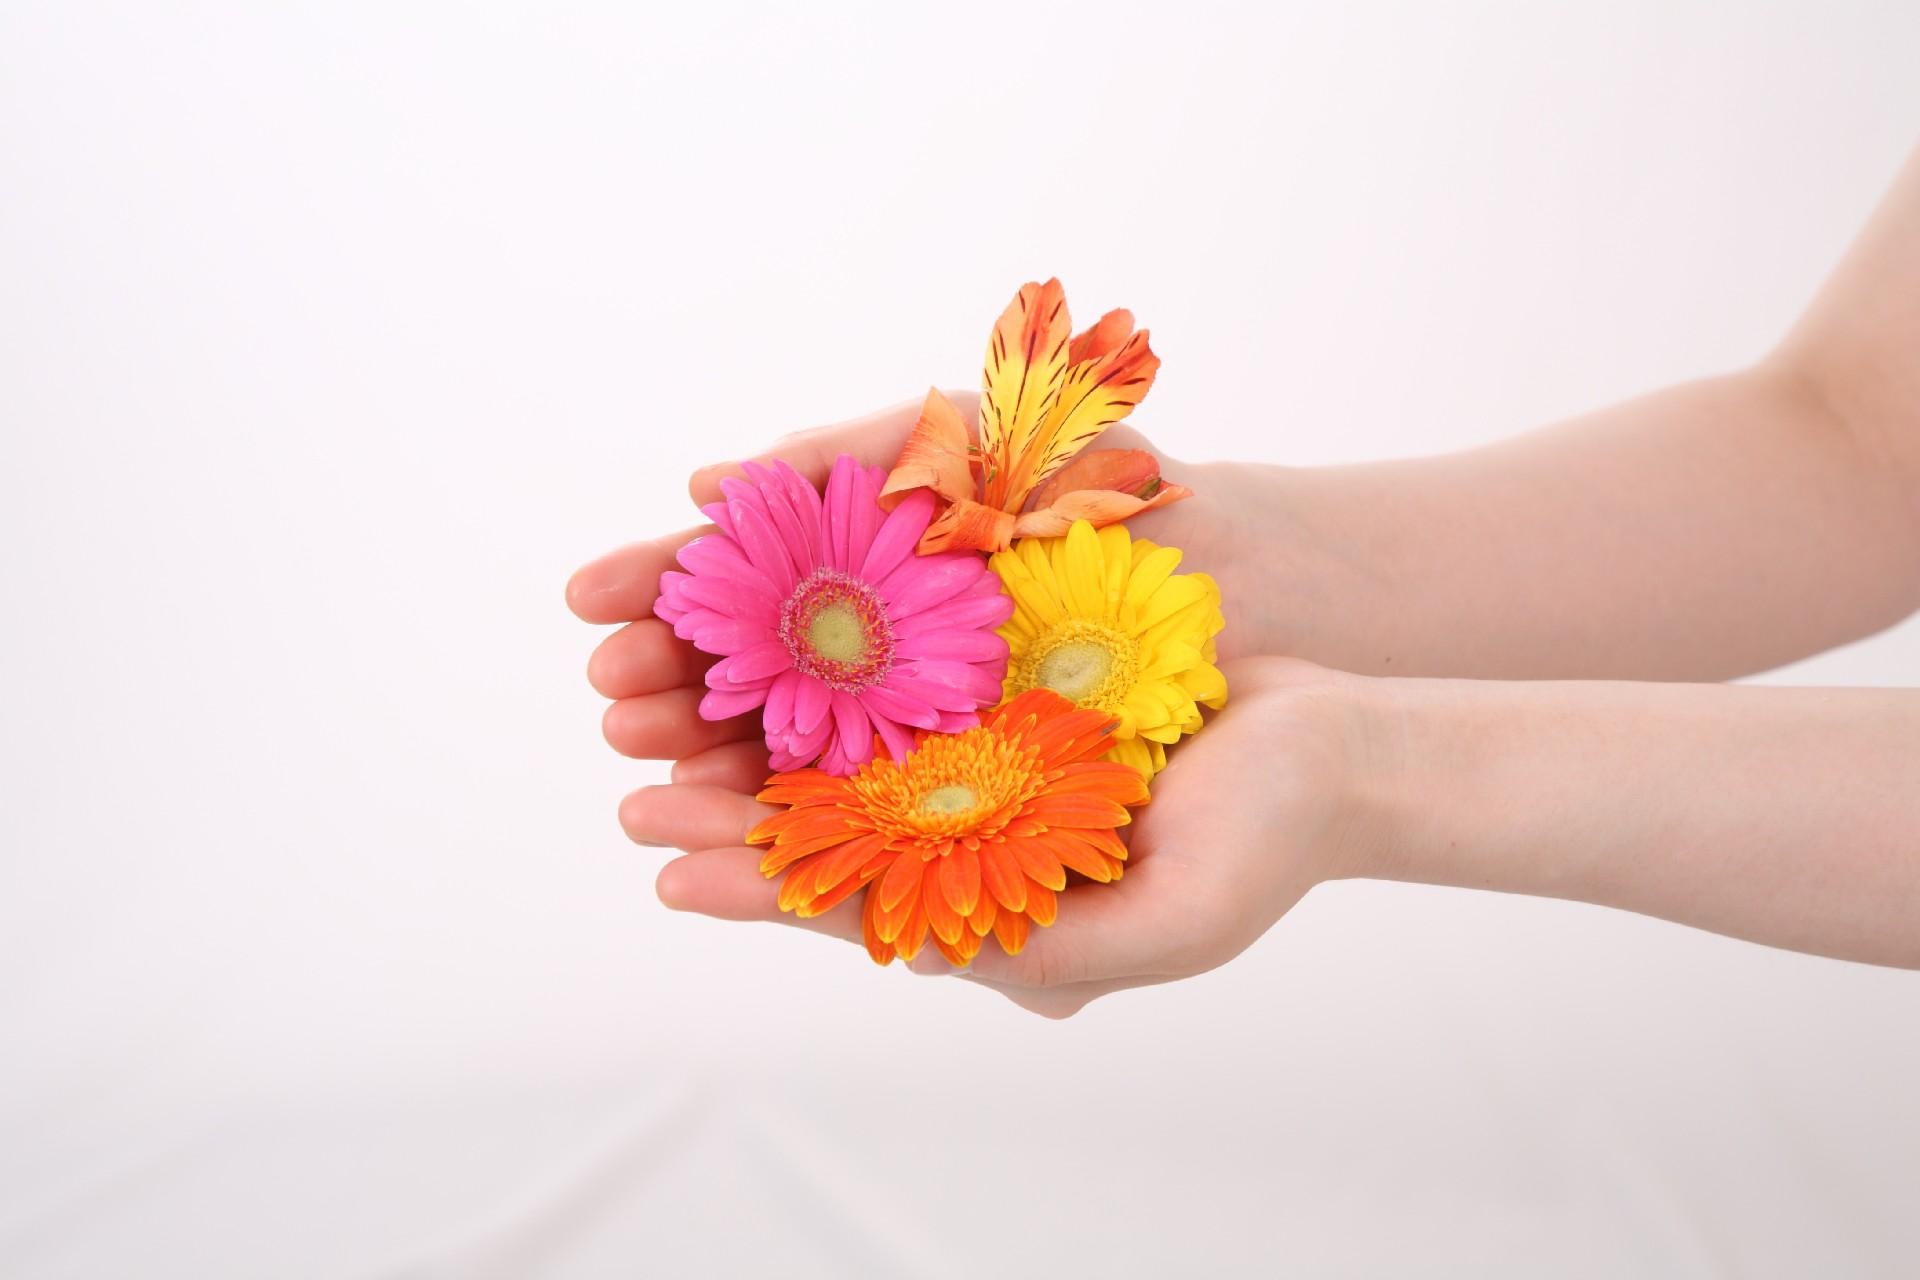 floweronhand.jpg